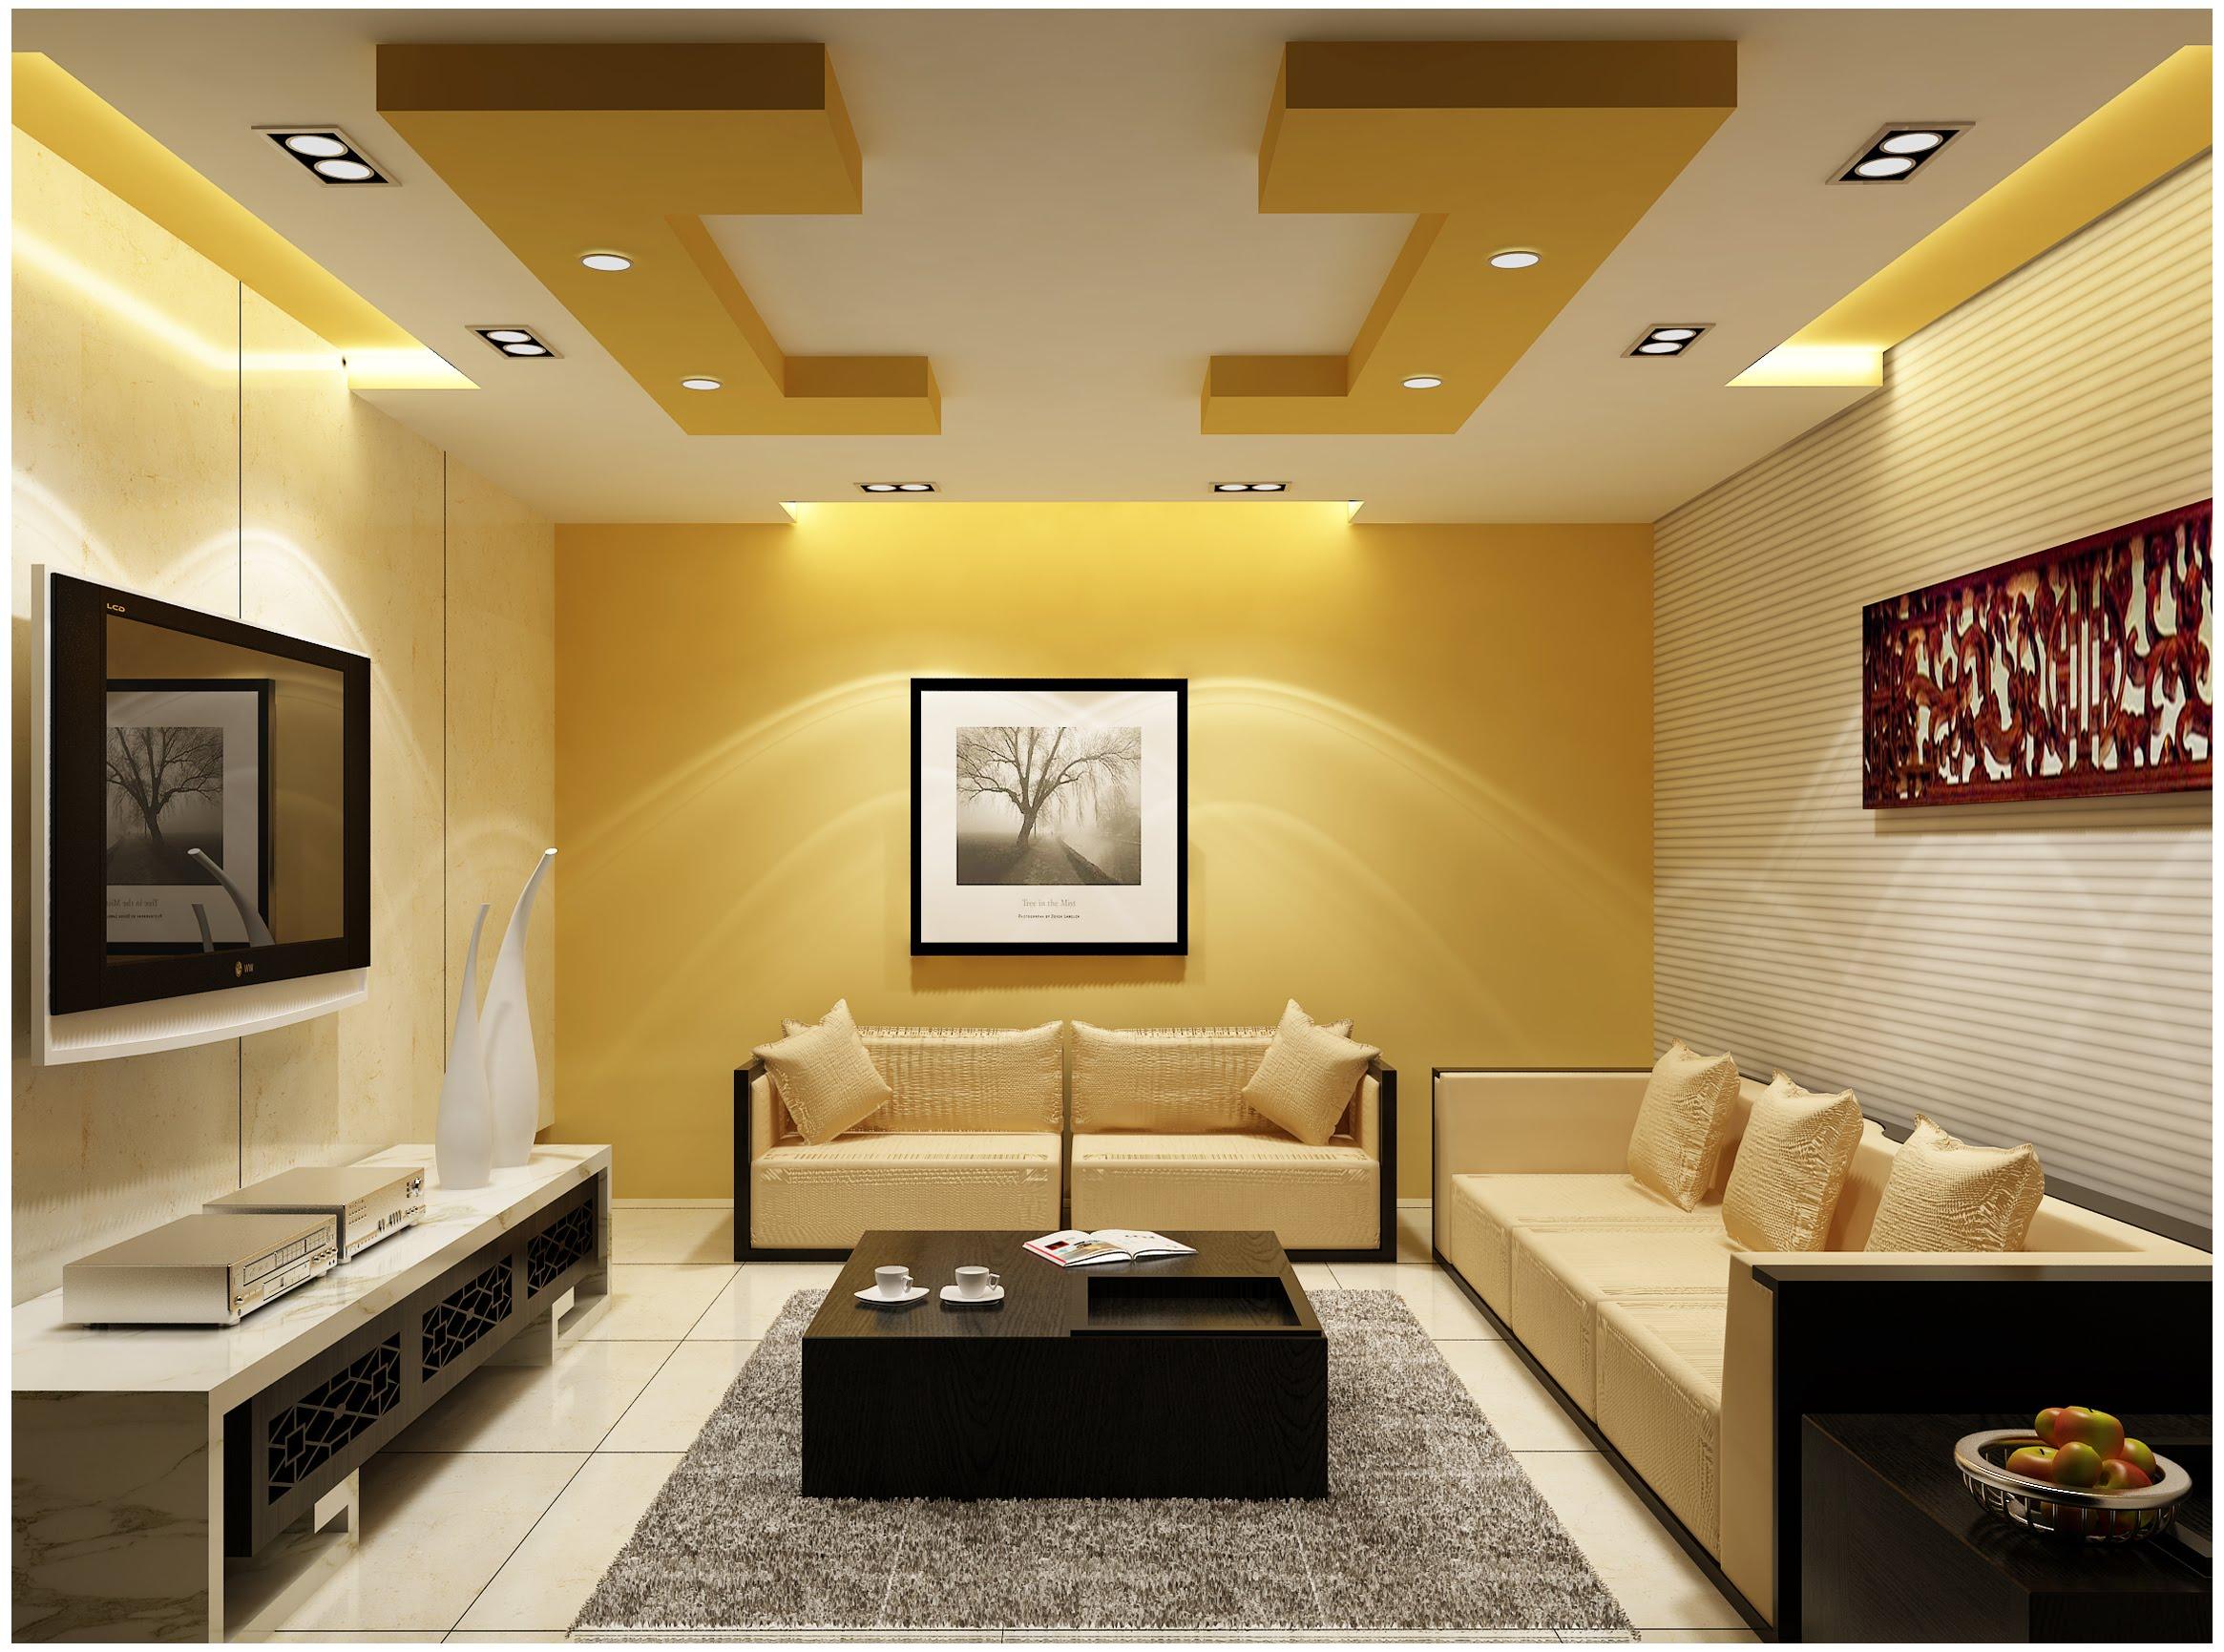 Bedroom Pop Ceiling Designs Images 2016